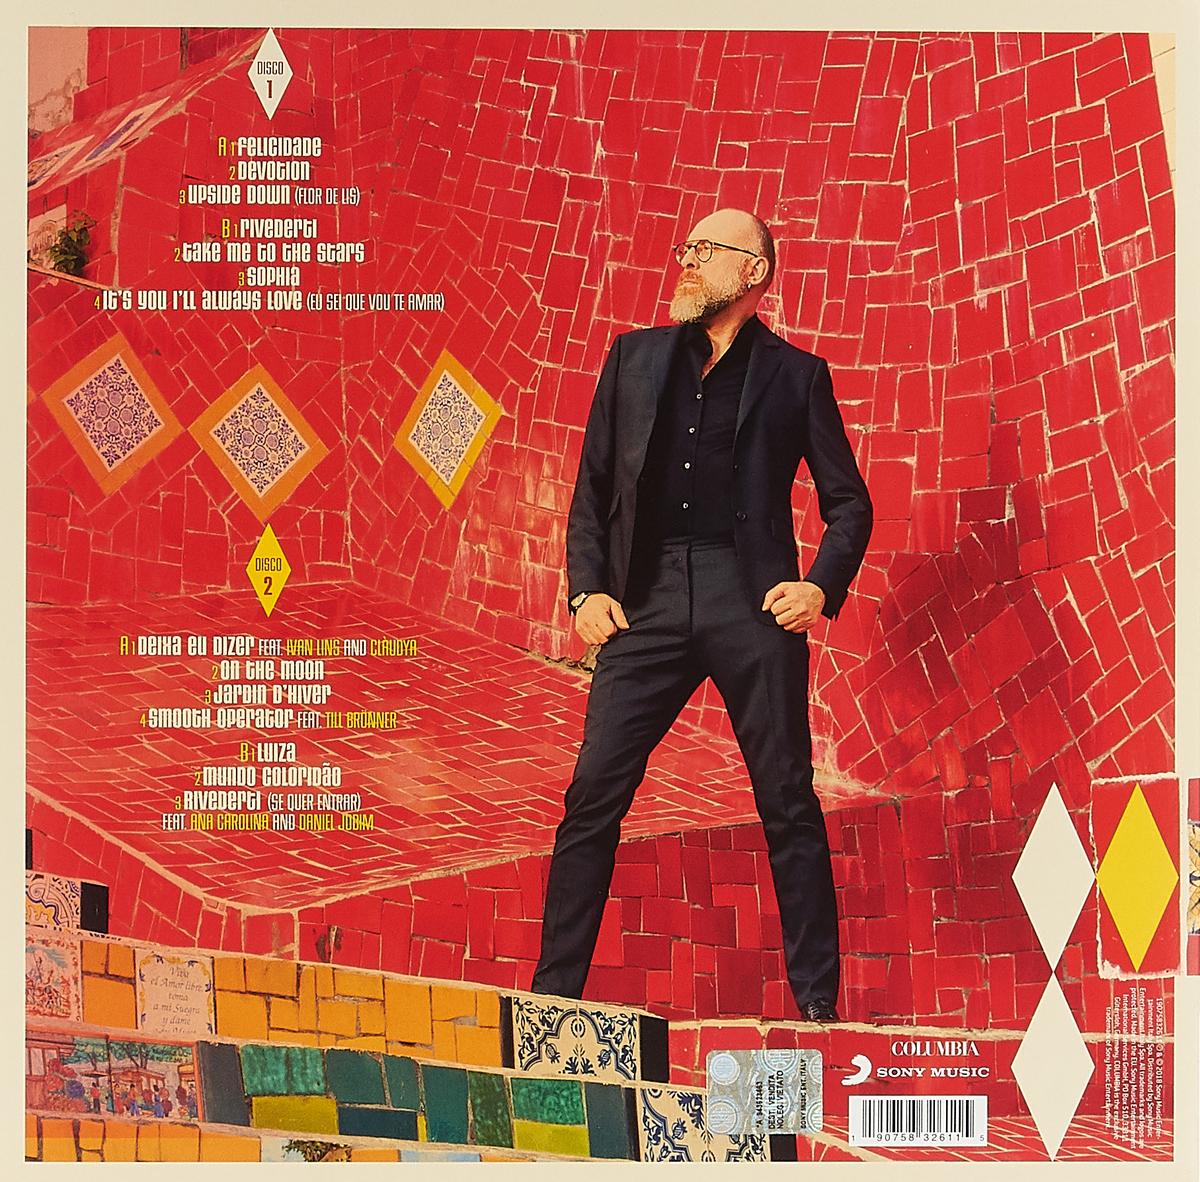 Марио Бионди Mario Biondi. Brasil (2 LP) марио бионди mario biondi best of soul 2 cd